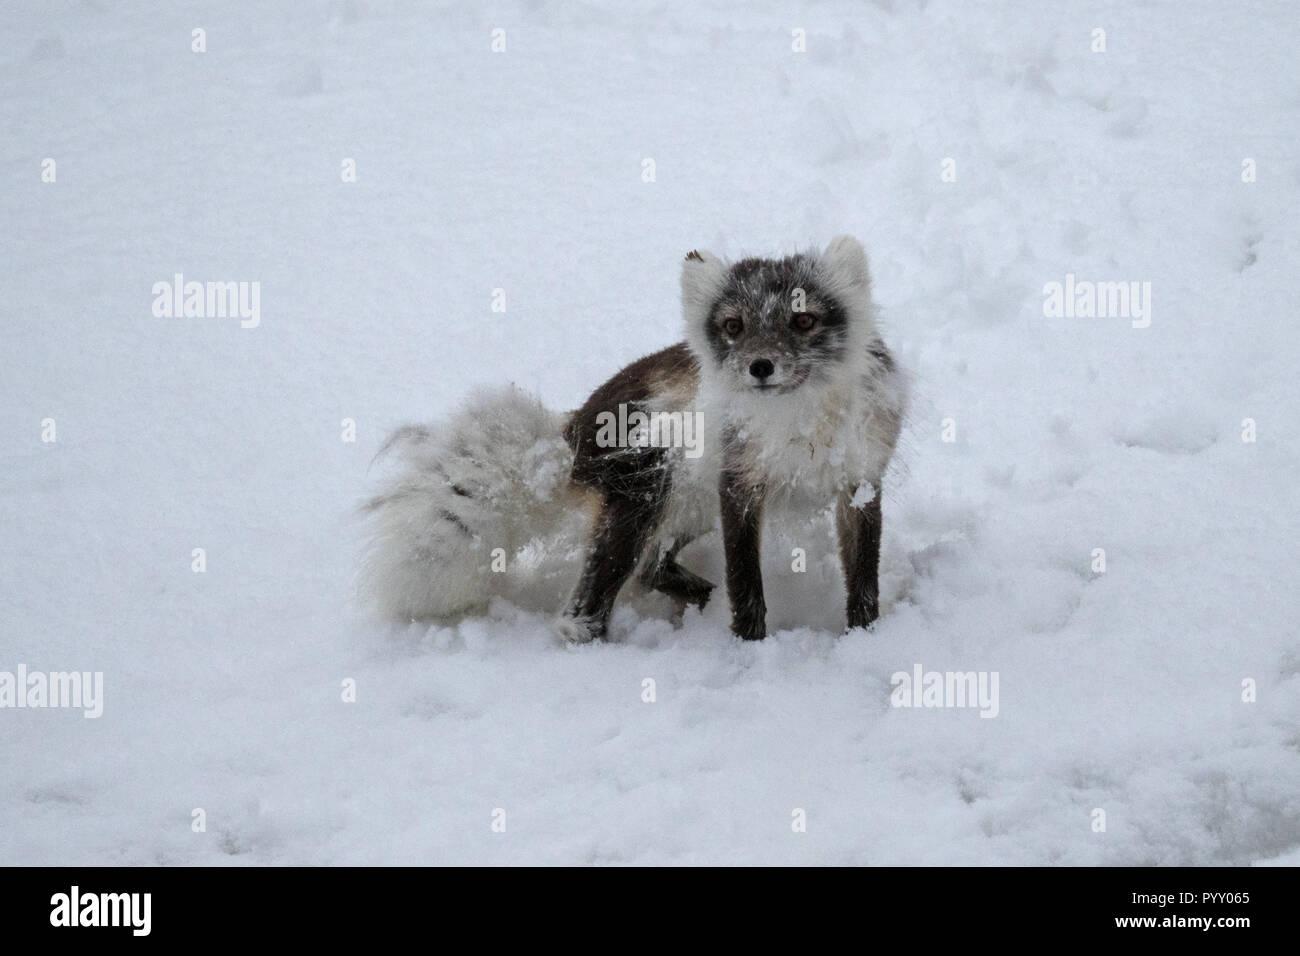 Arctic fox in the snow - Stock Image